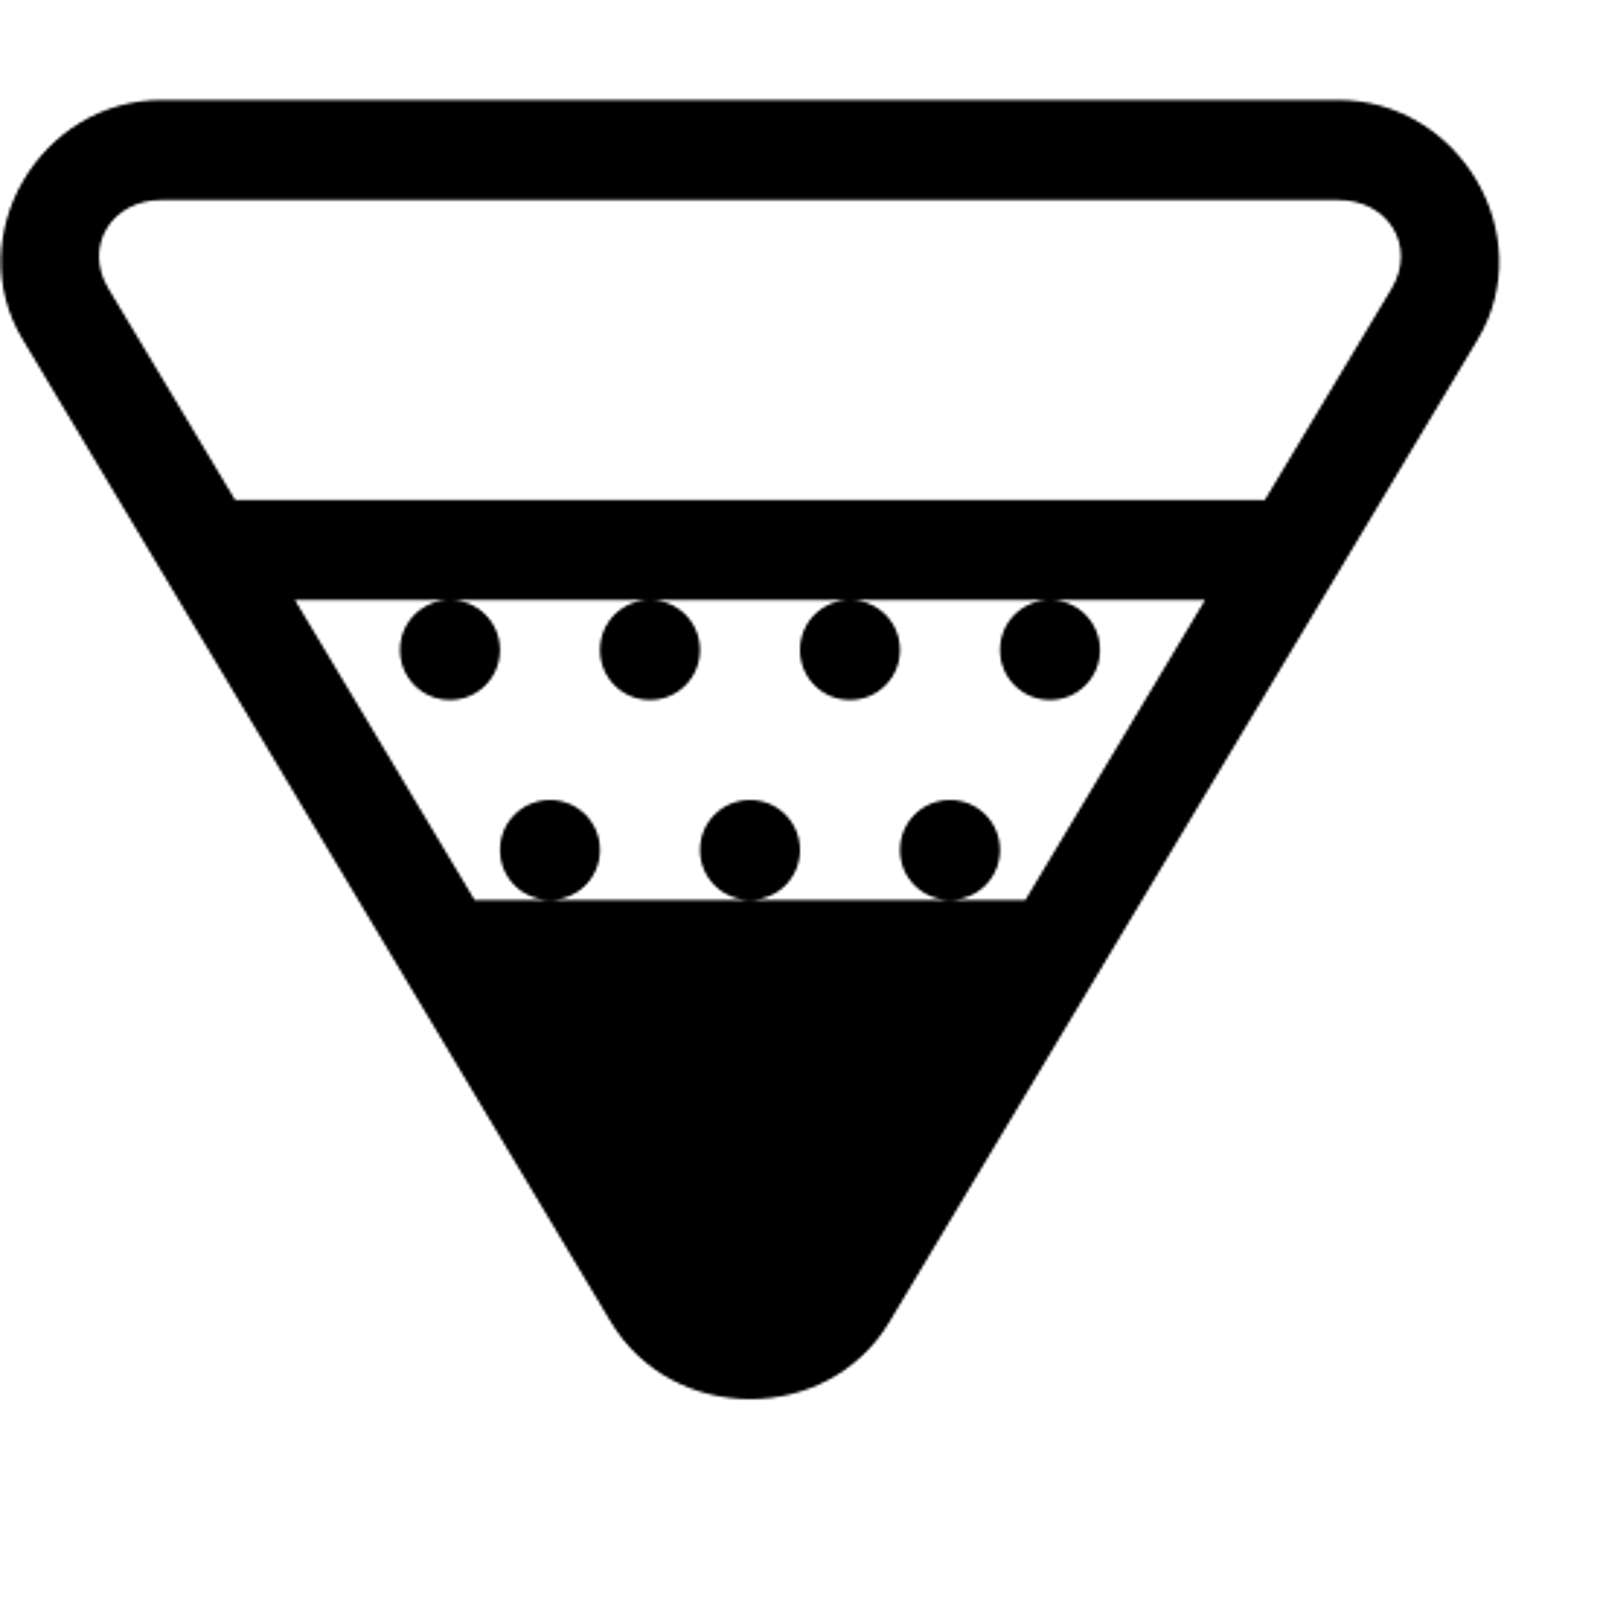 Rurociąg icon